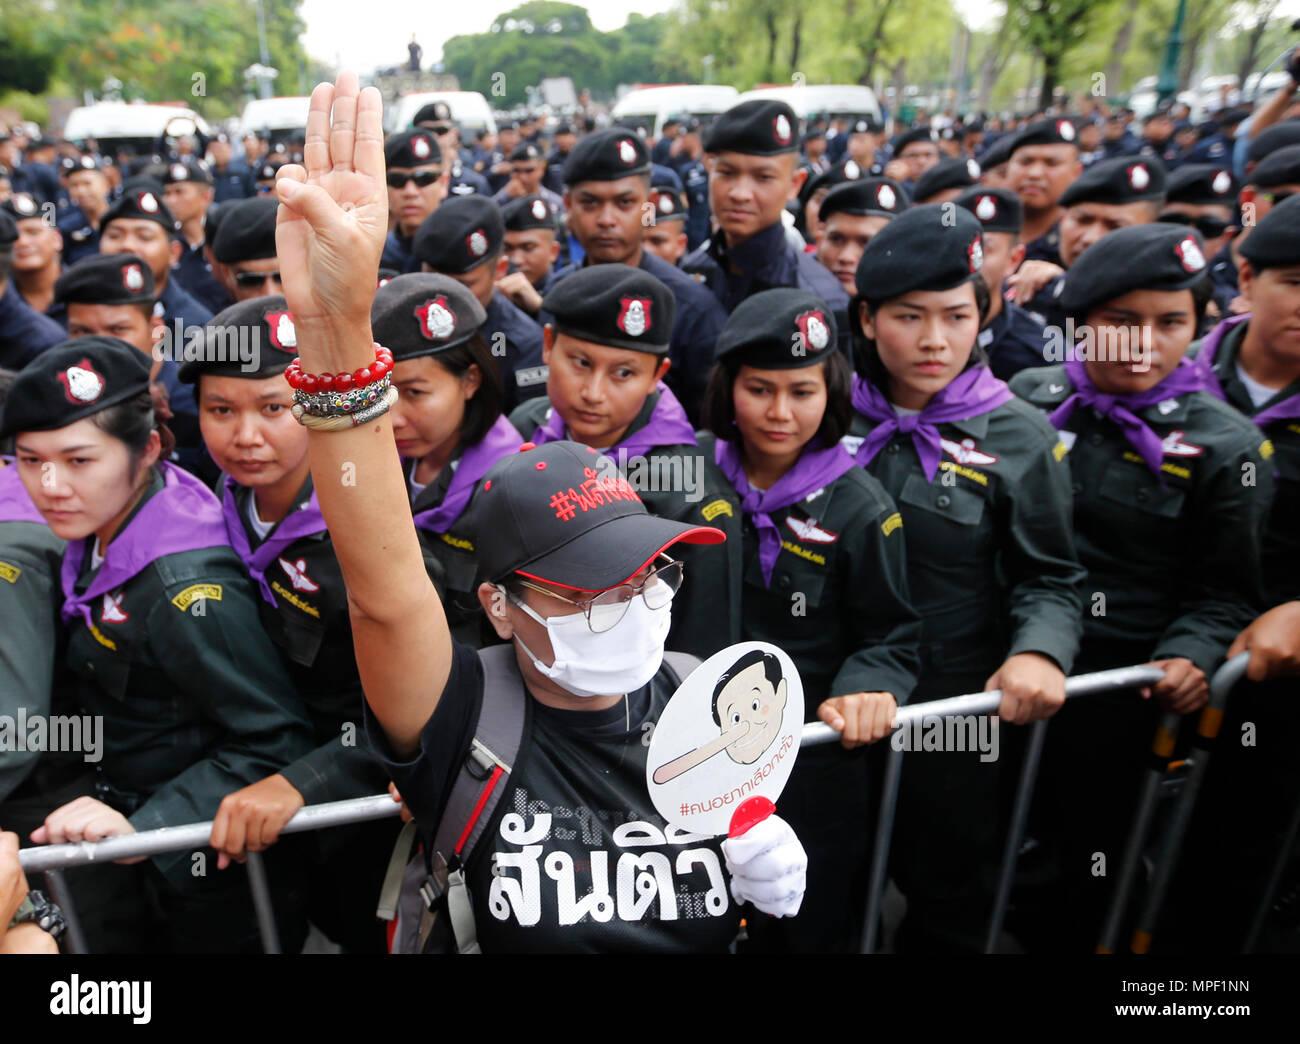 22nd May 2018 Thai Pro Democracy Activist Hold Hand